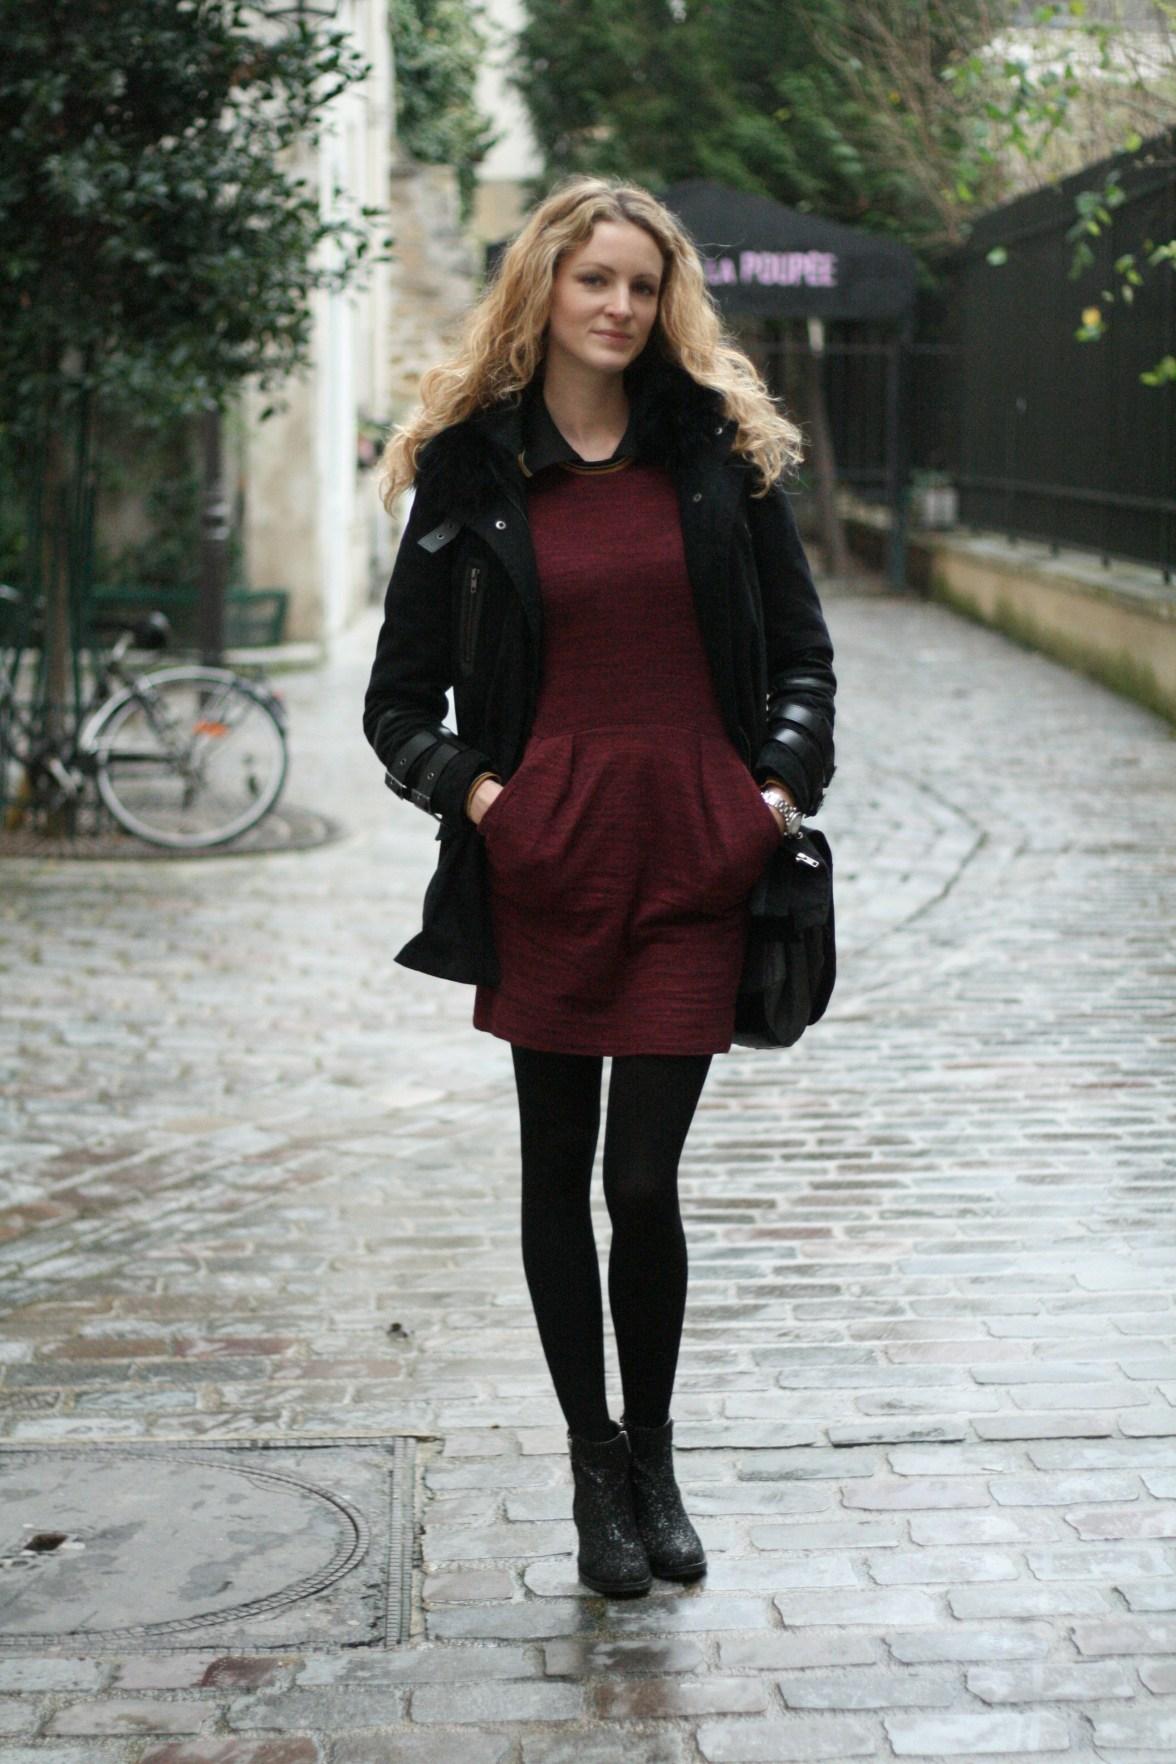 en mode robe